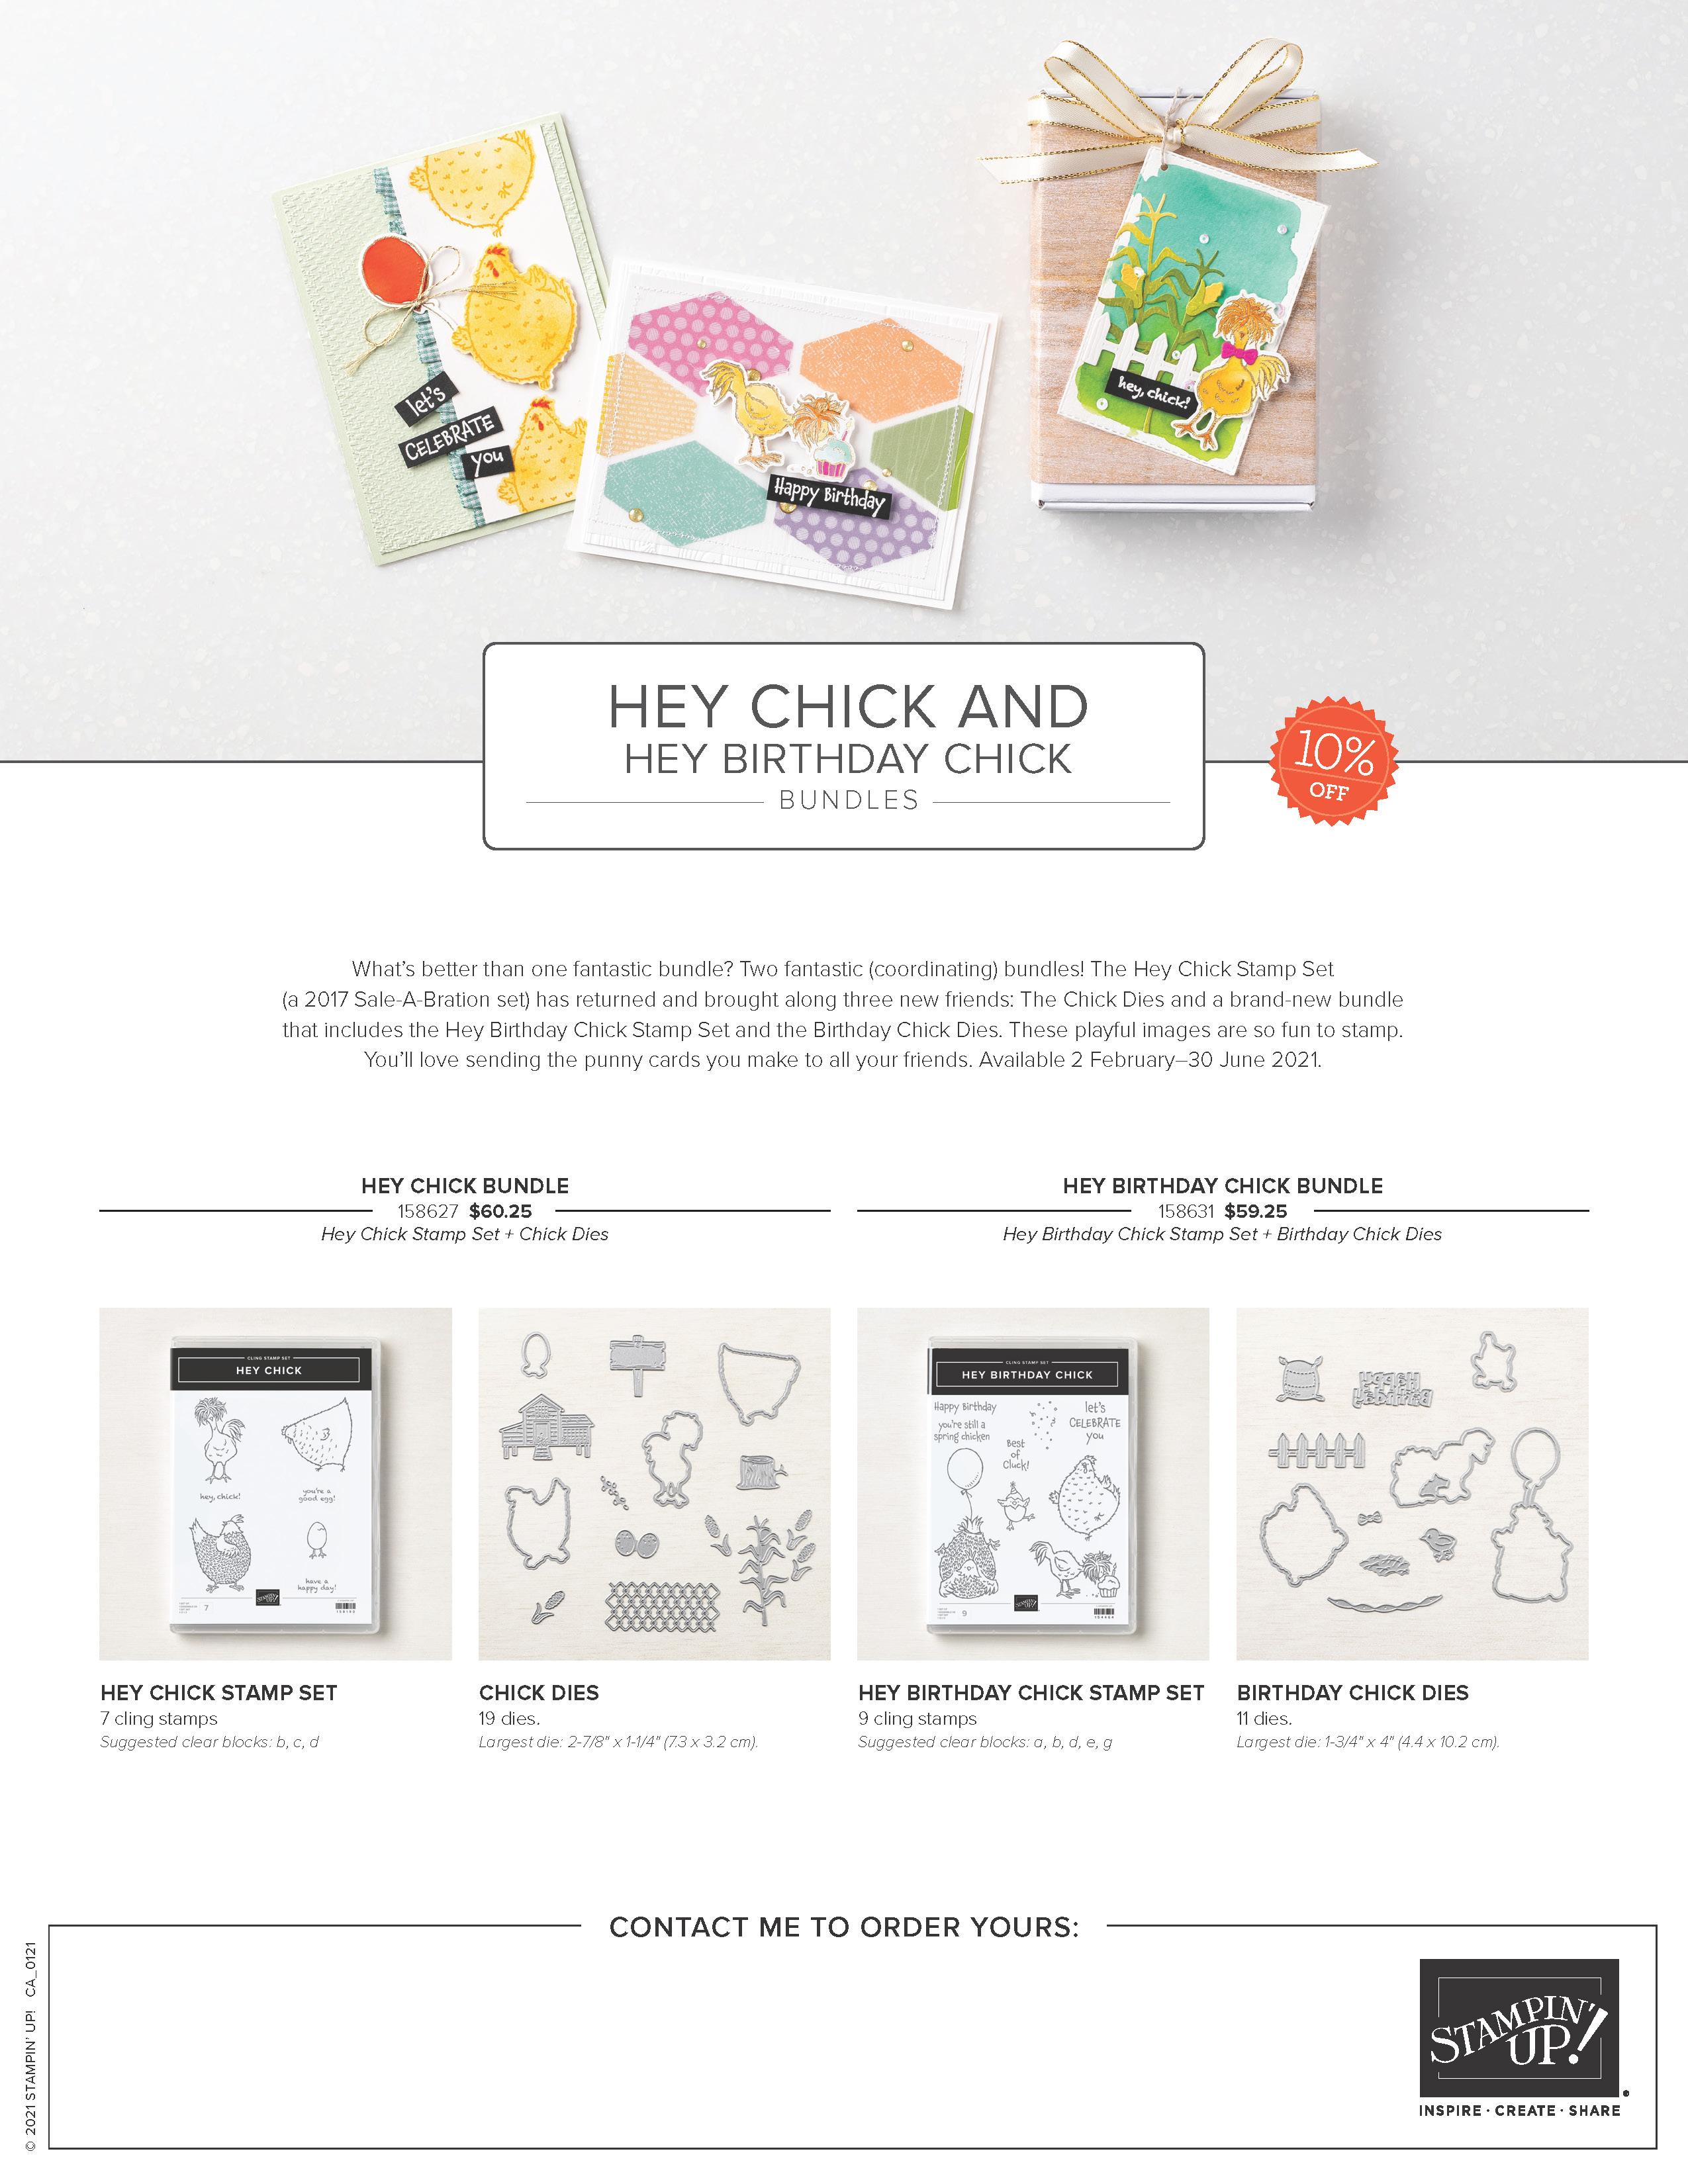 Hey Chick and Hey Birthday Chick Bundles Marketing Flyer CA